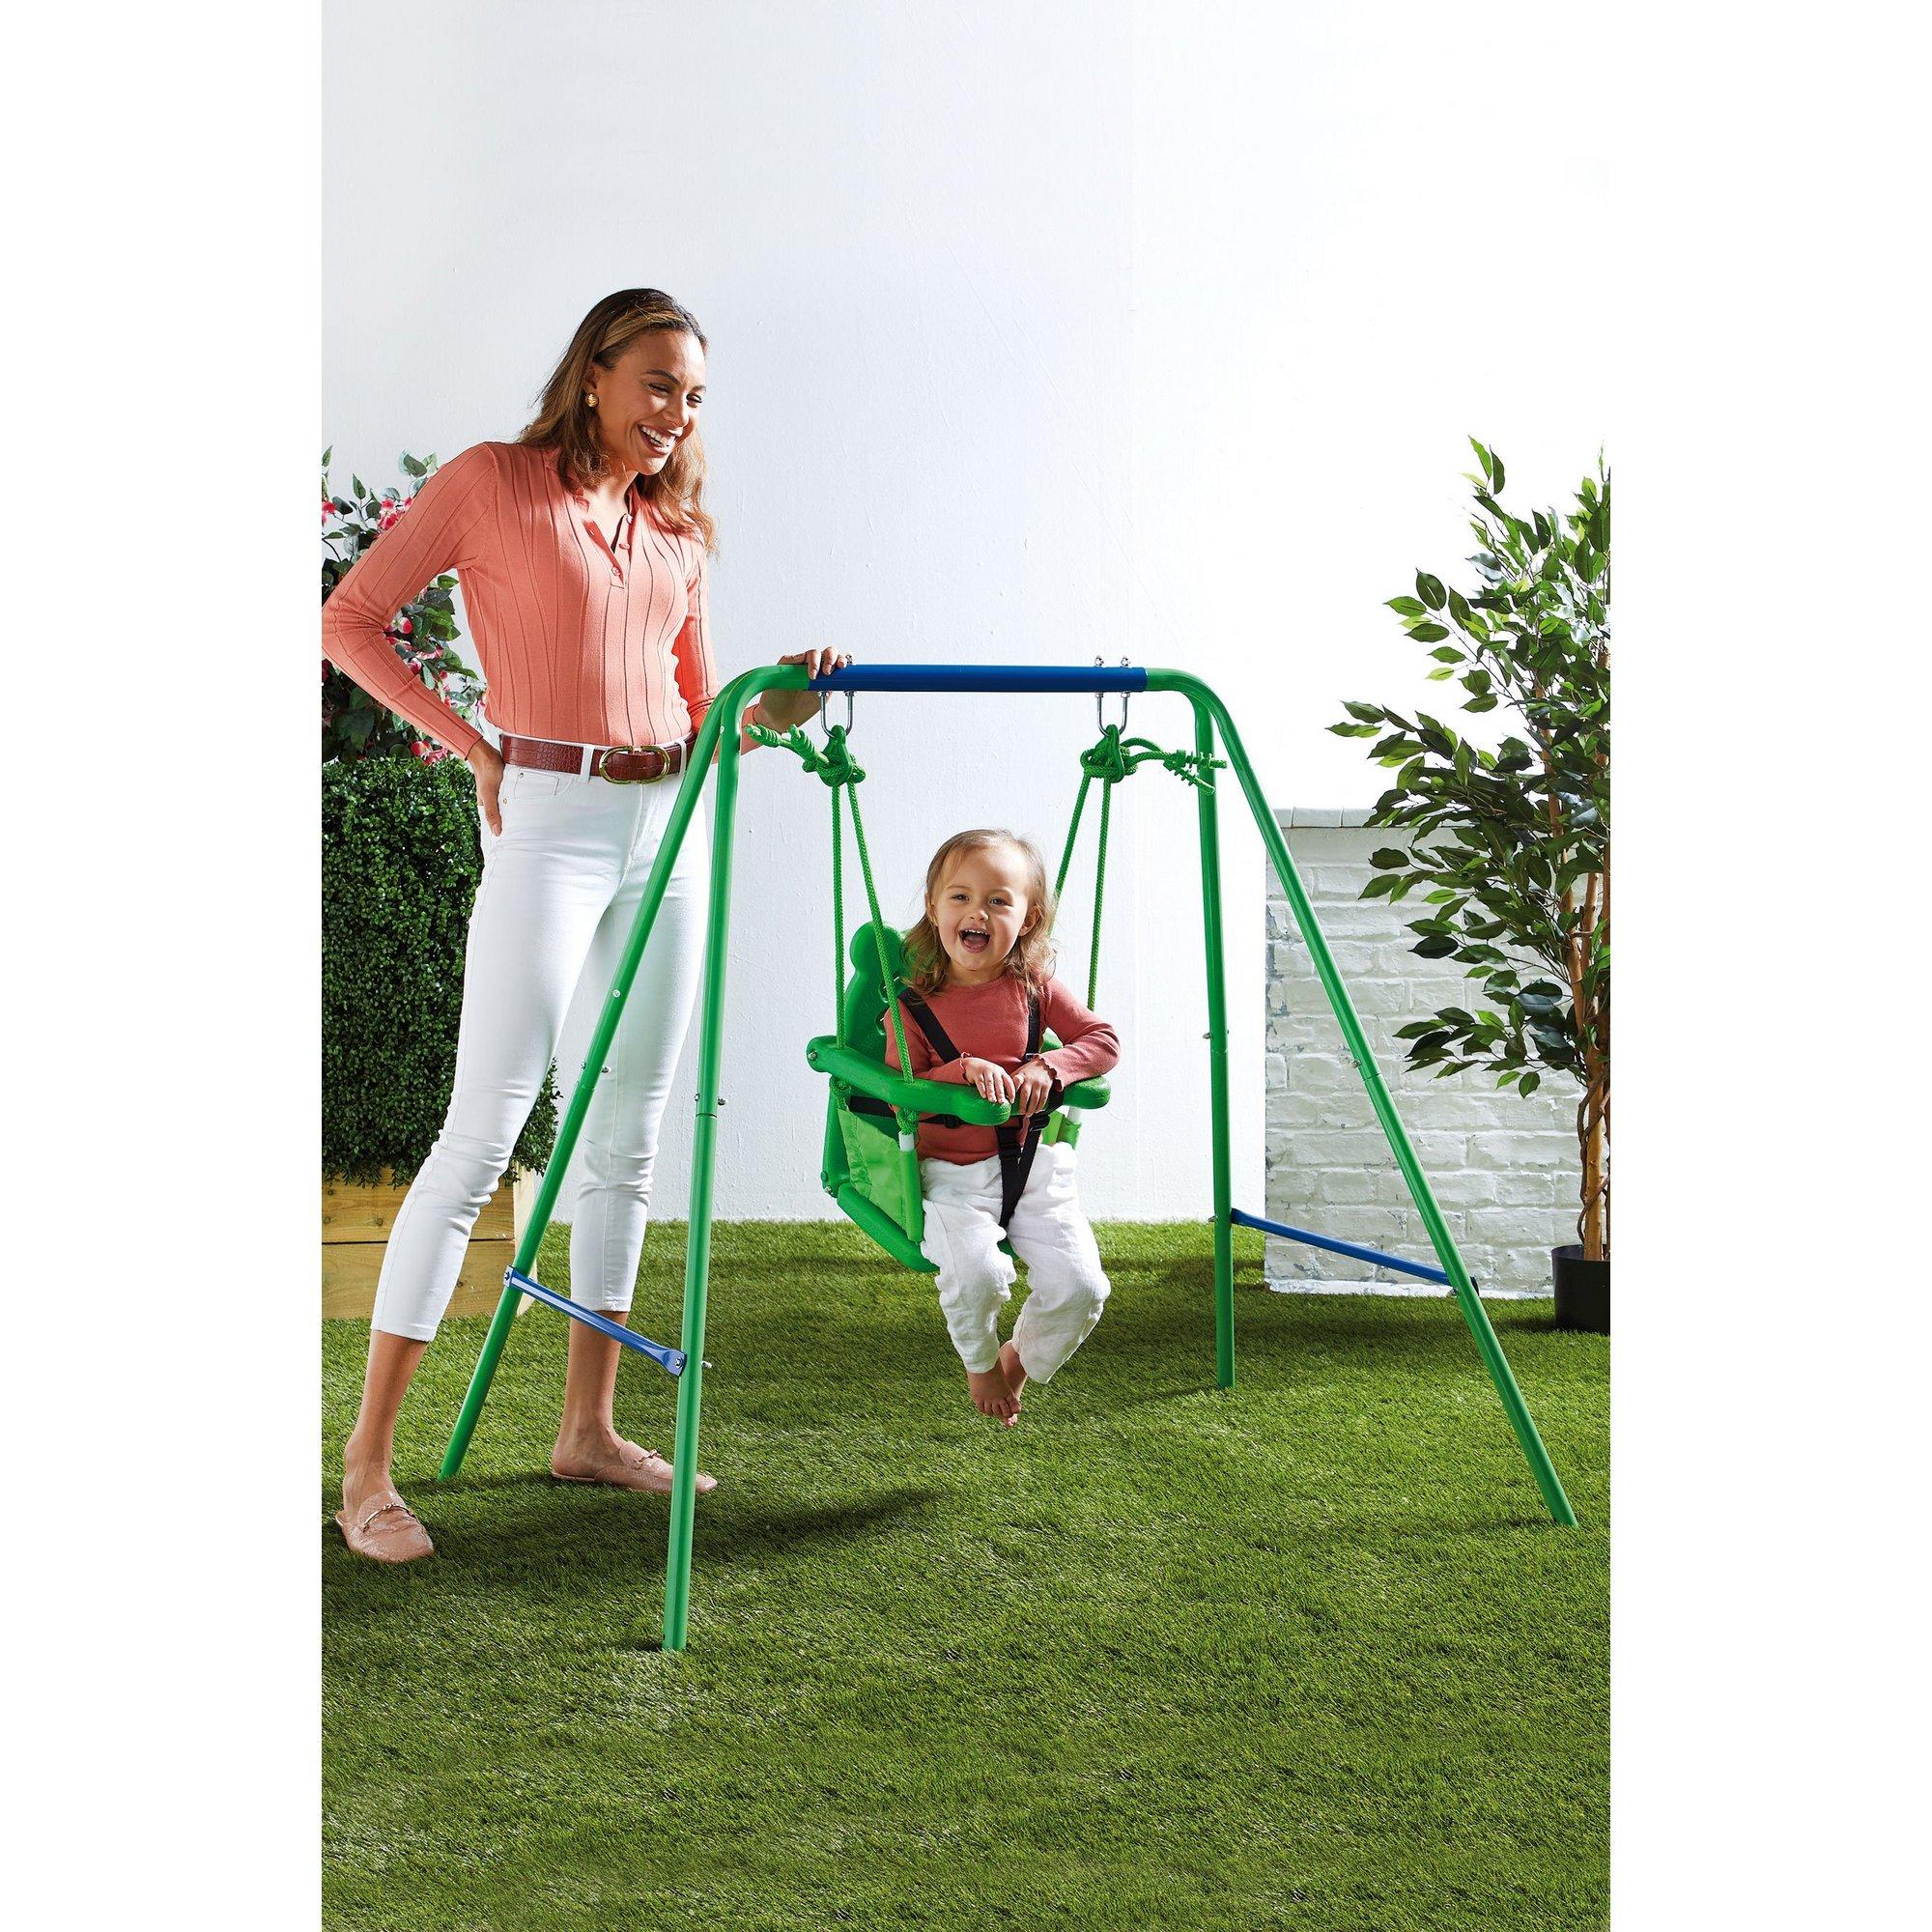 Image of Nursery Swing with Fabric Seat